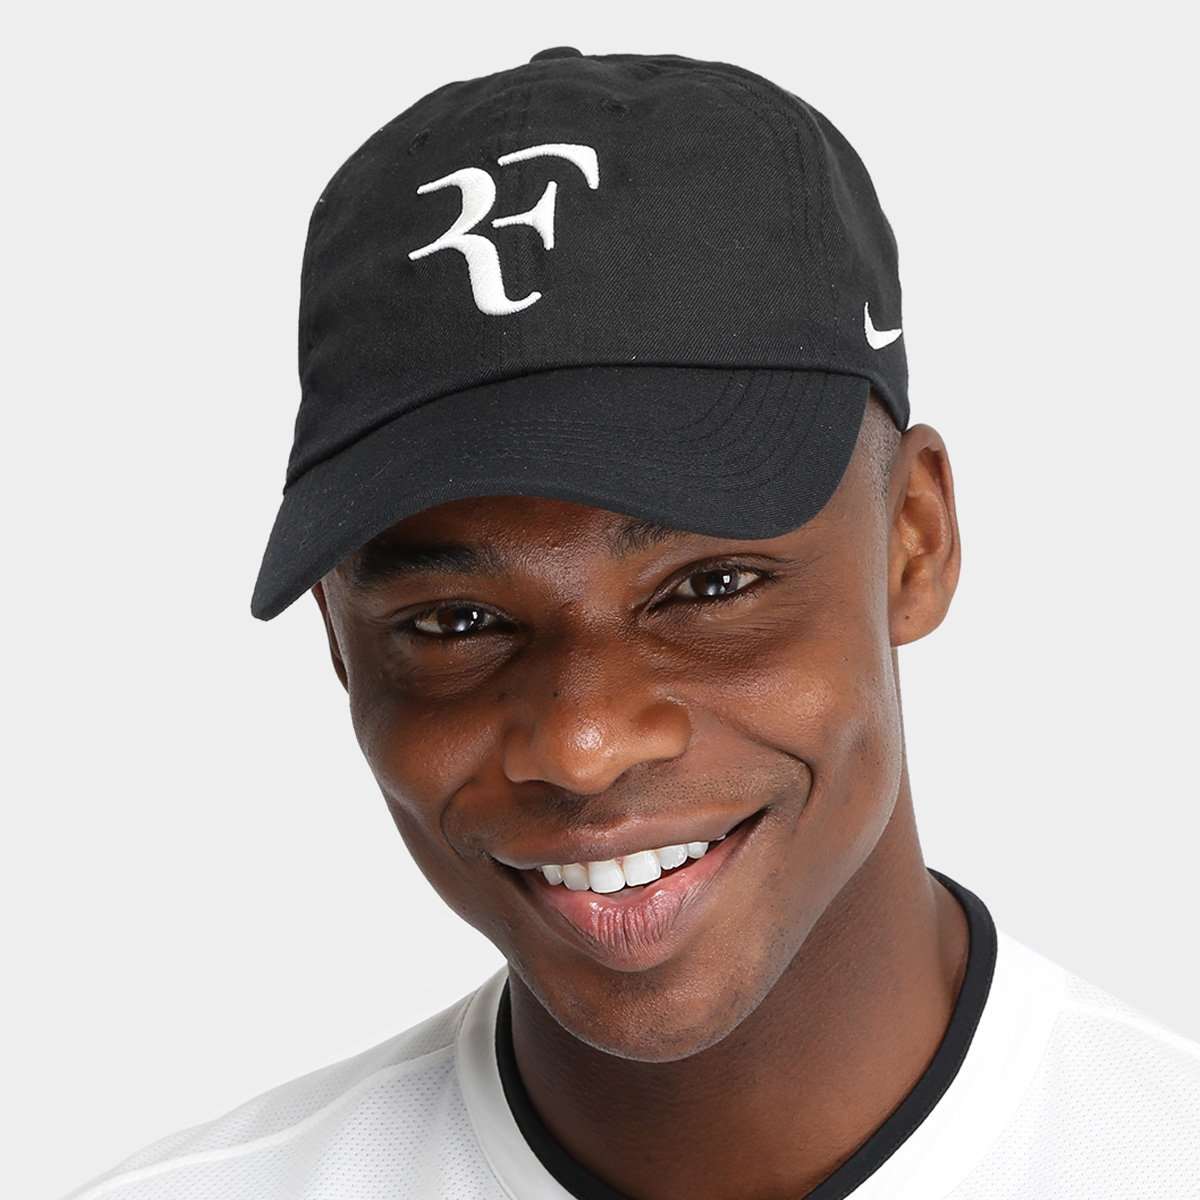 Boné Nike Aba Curva Aerobill Federer H86 - Preto e Branco - Compre ... 14b002cb831